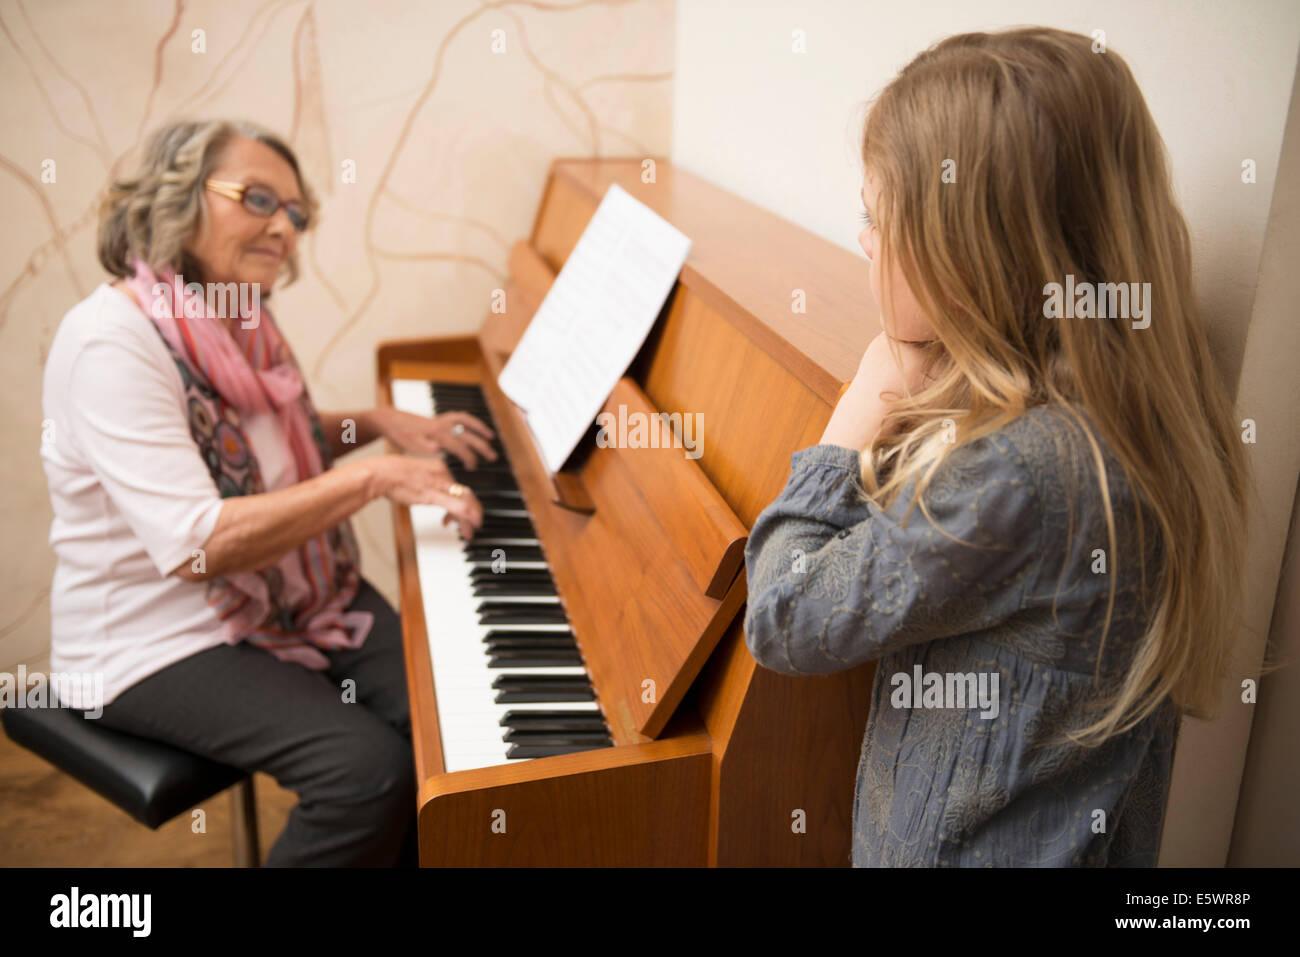 Petite-fille regardant grand-mère joue du piano Photo Stock